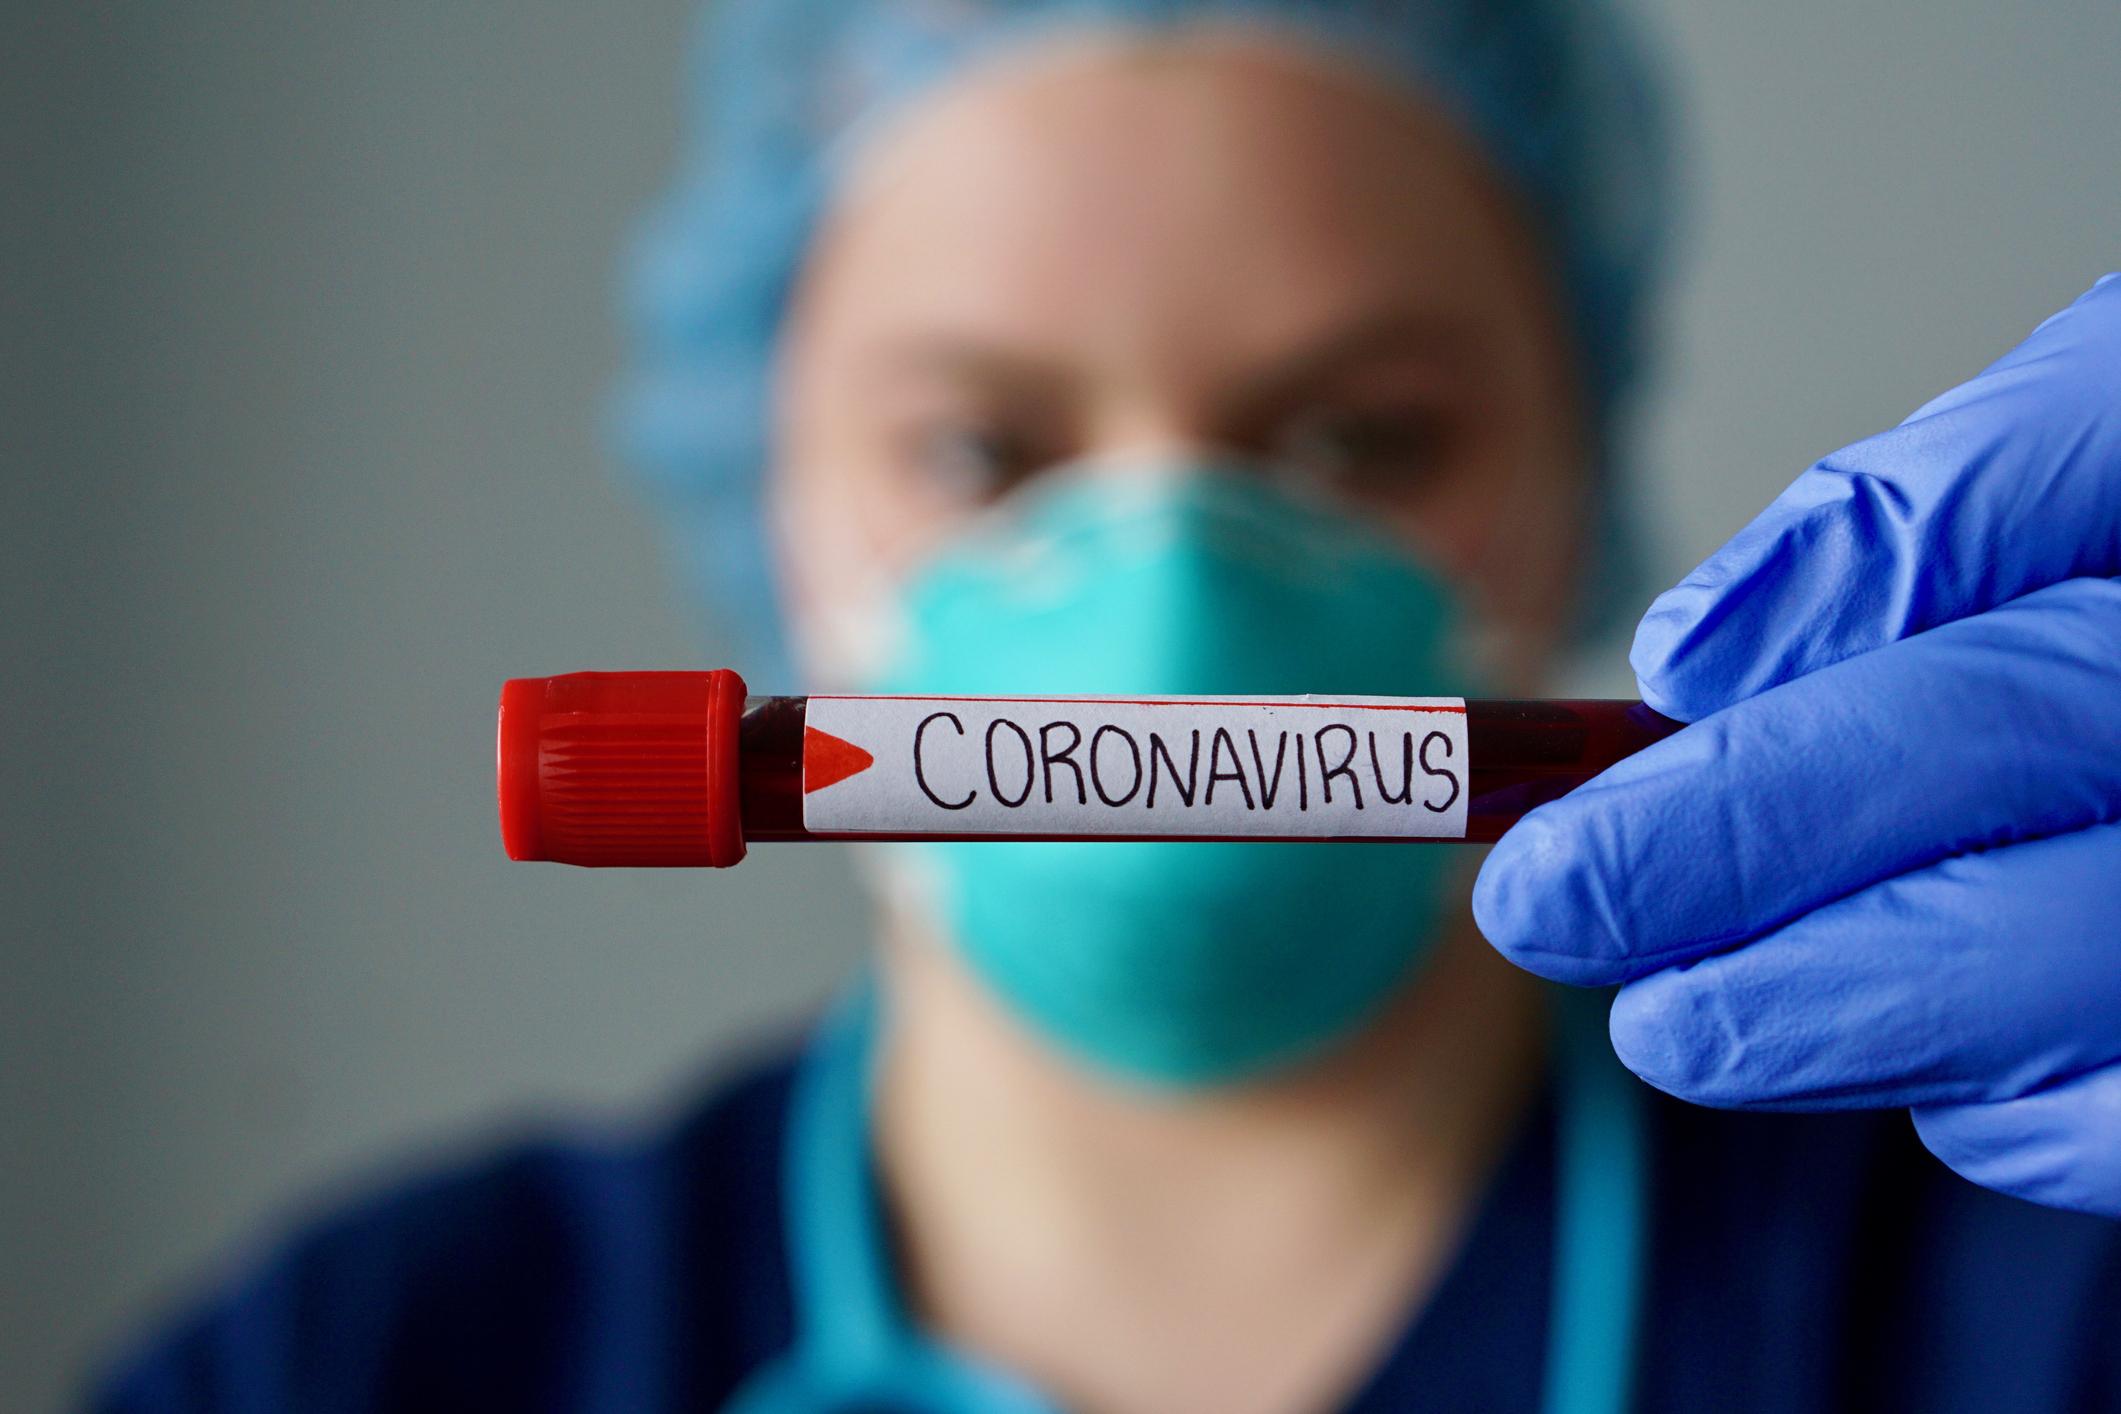 Pandemia de Coronavirus crea el pánico en residentes de Pensilvania Occidental